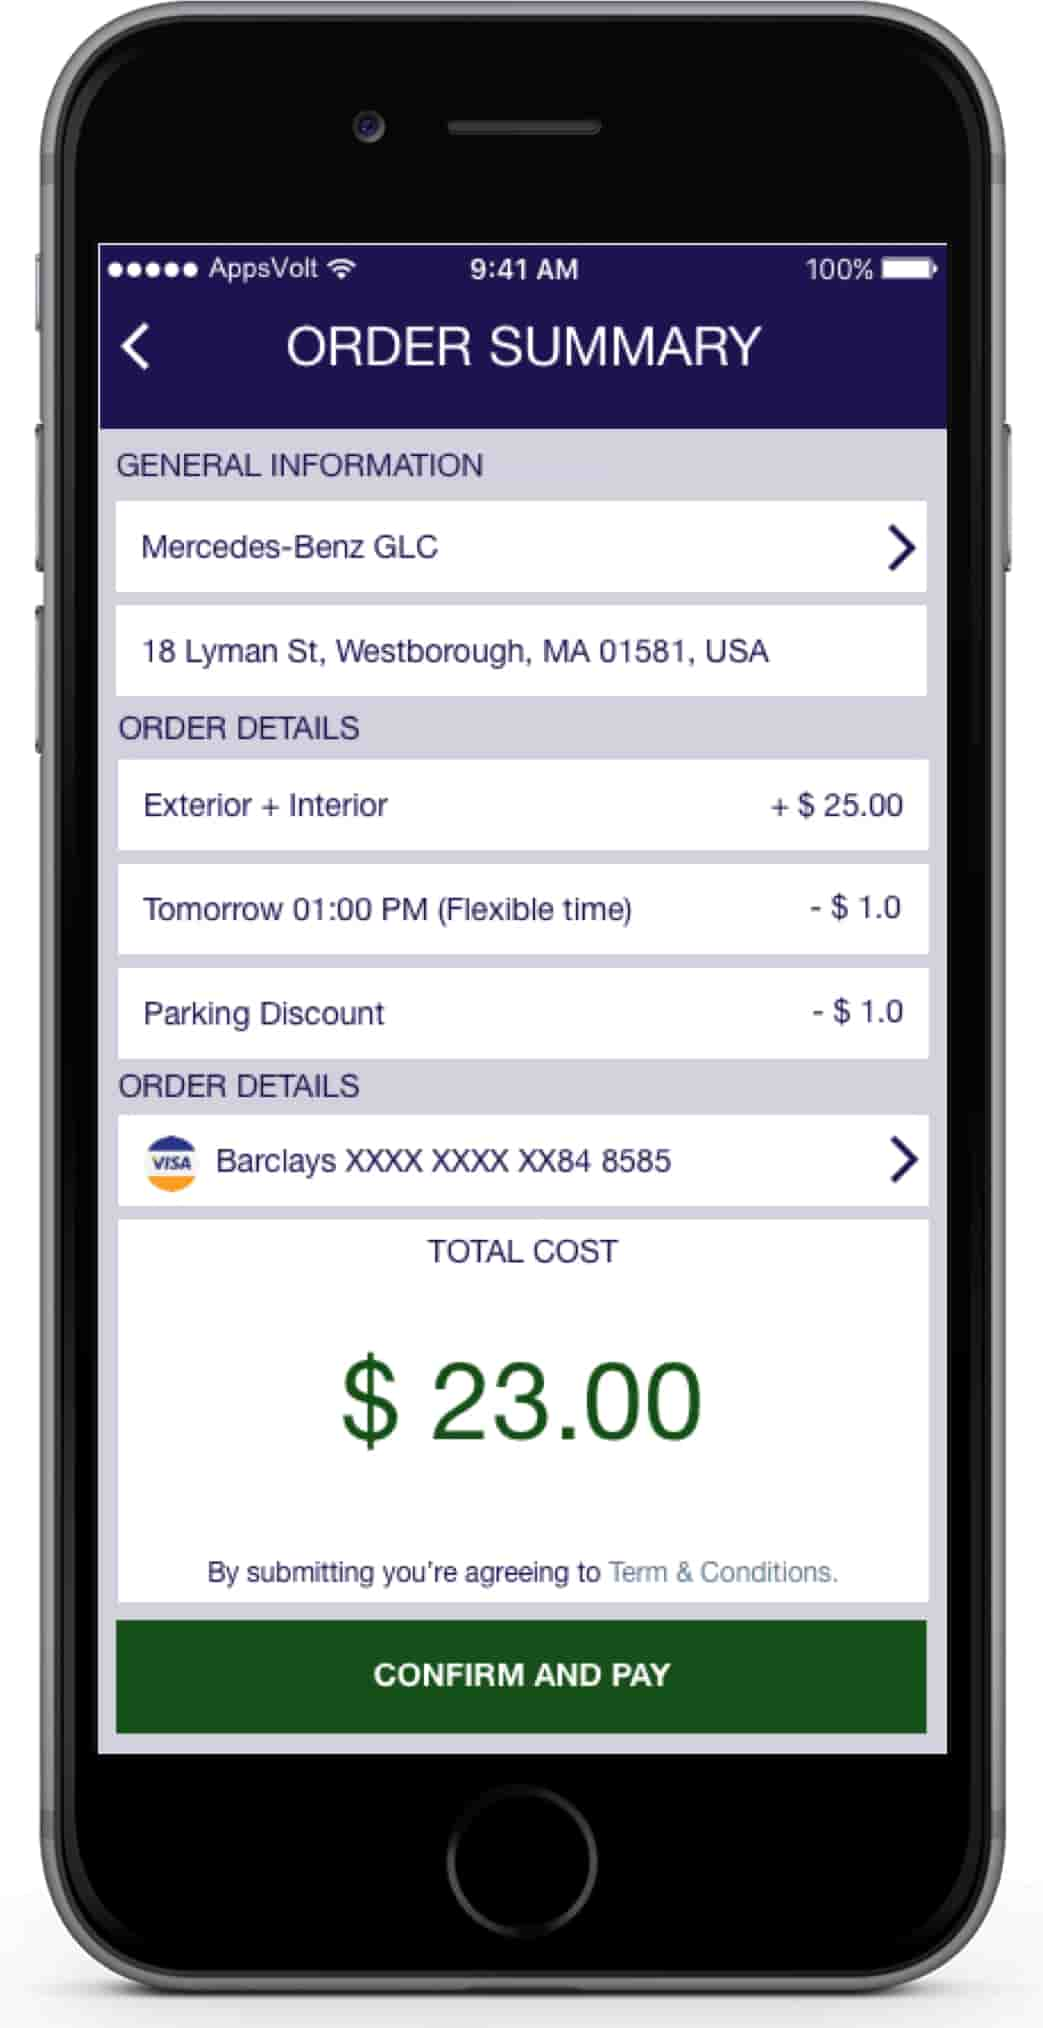 Car Washing Booking iOS Application-order-summary